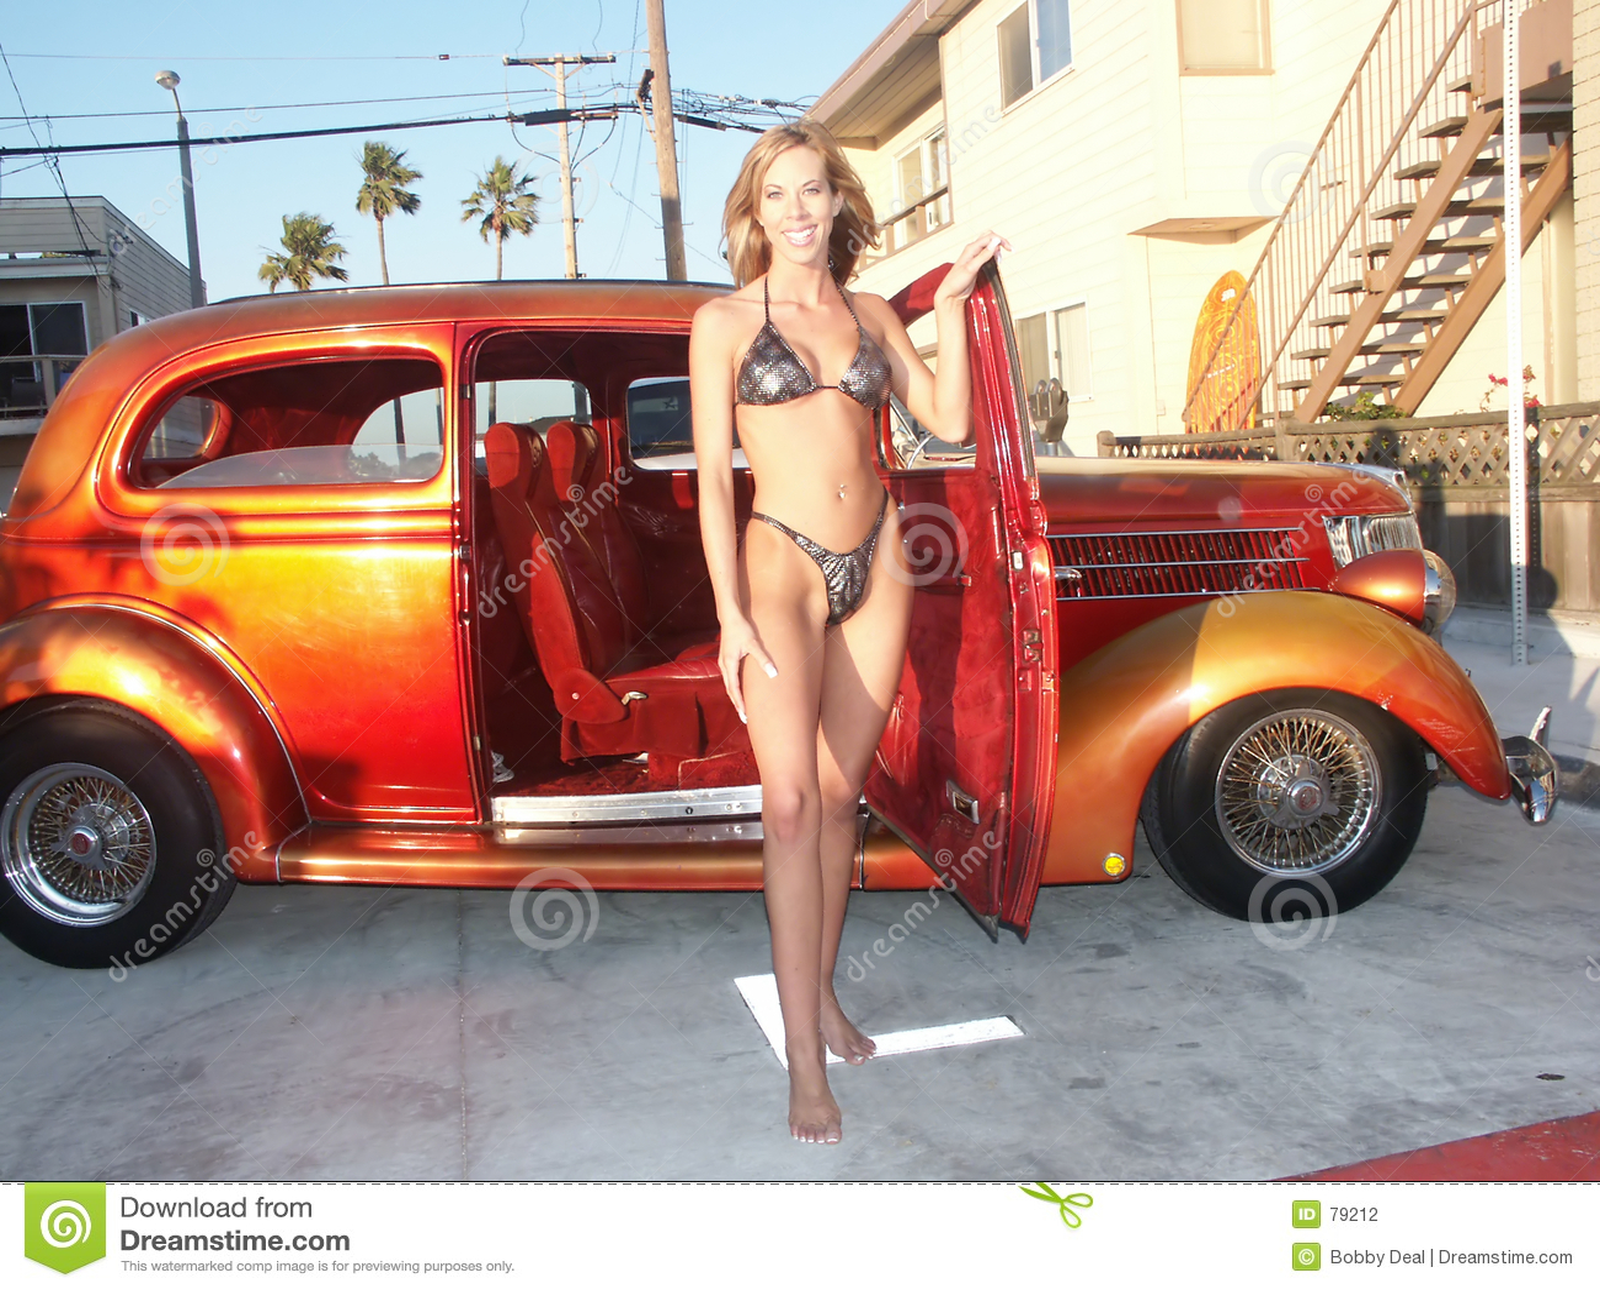 Andrea 5 bikini